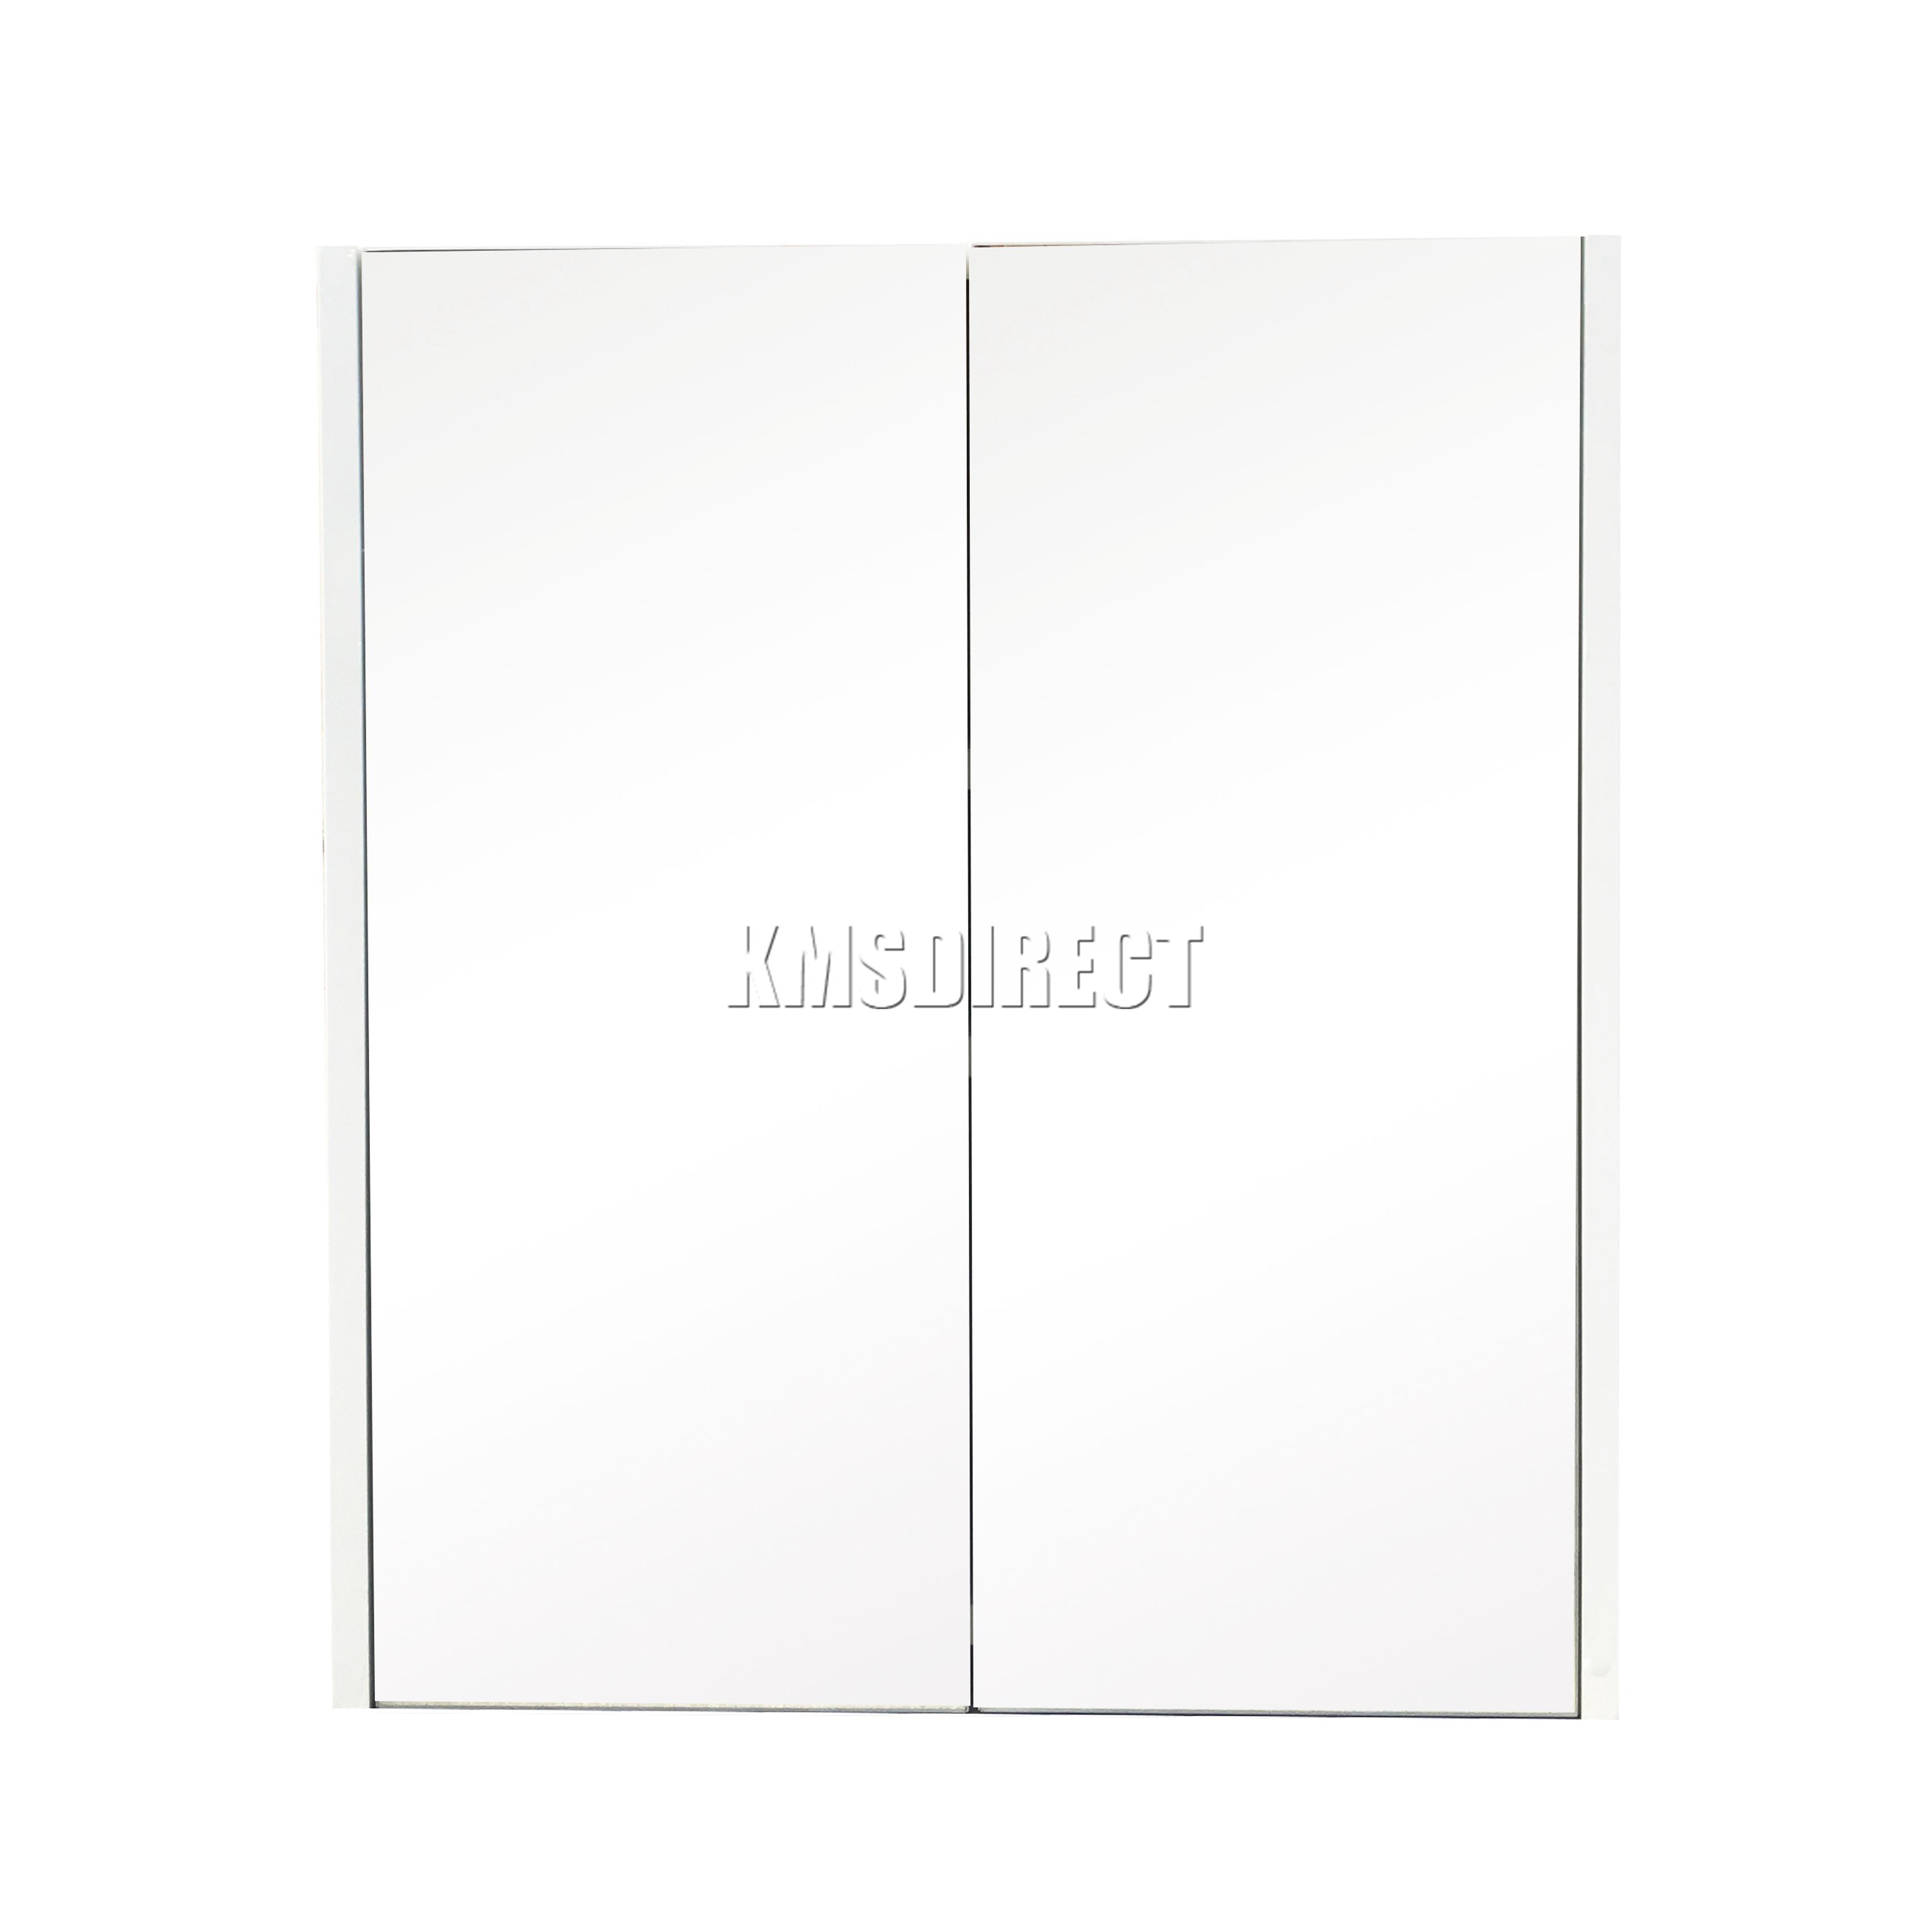 White Mirrored Bathroom Cabinets Foxhunter Wall Mount Mirror Bathroom Cabinet Unit Storage Cupboard